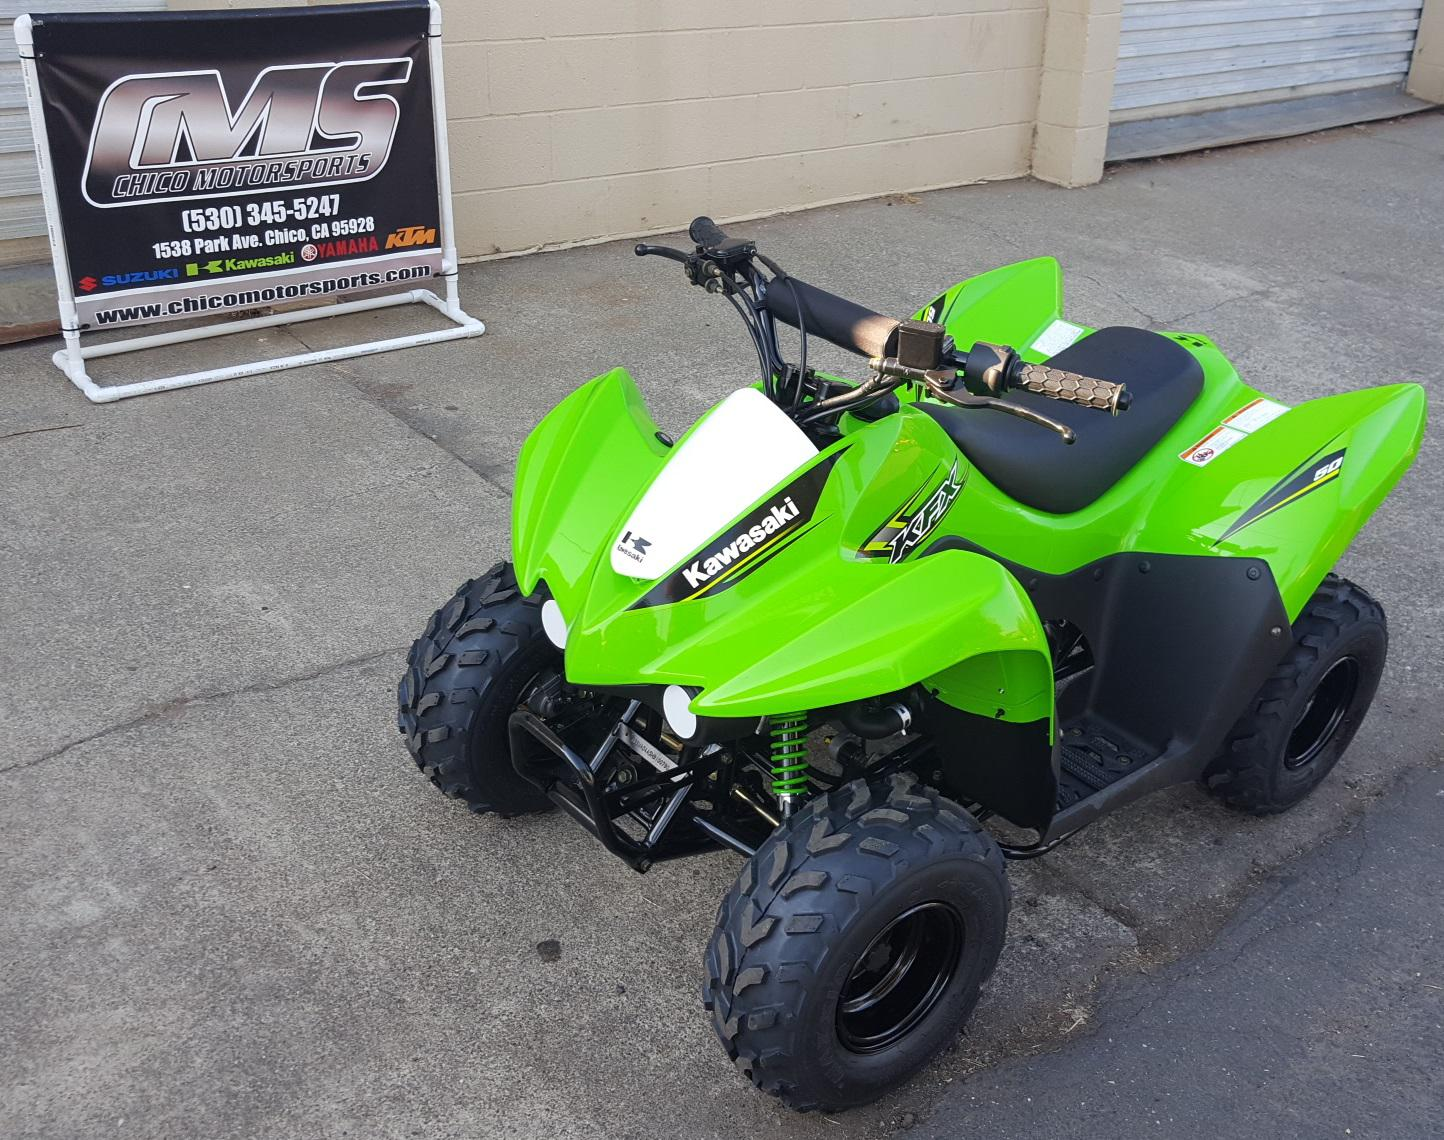 2017 kawasaki kfx 50 for sale in chico, ca | chico motorsports